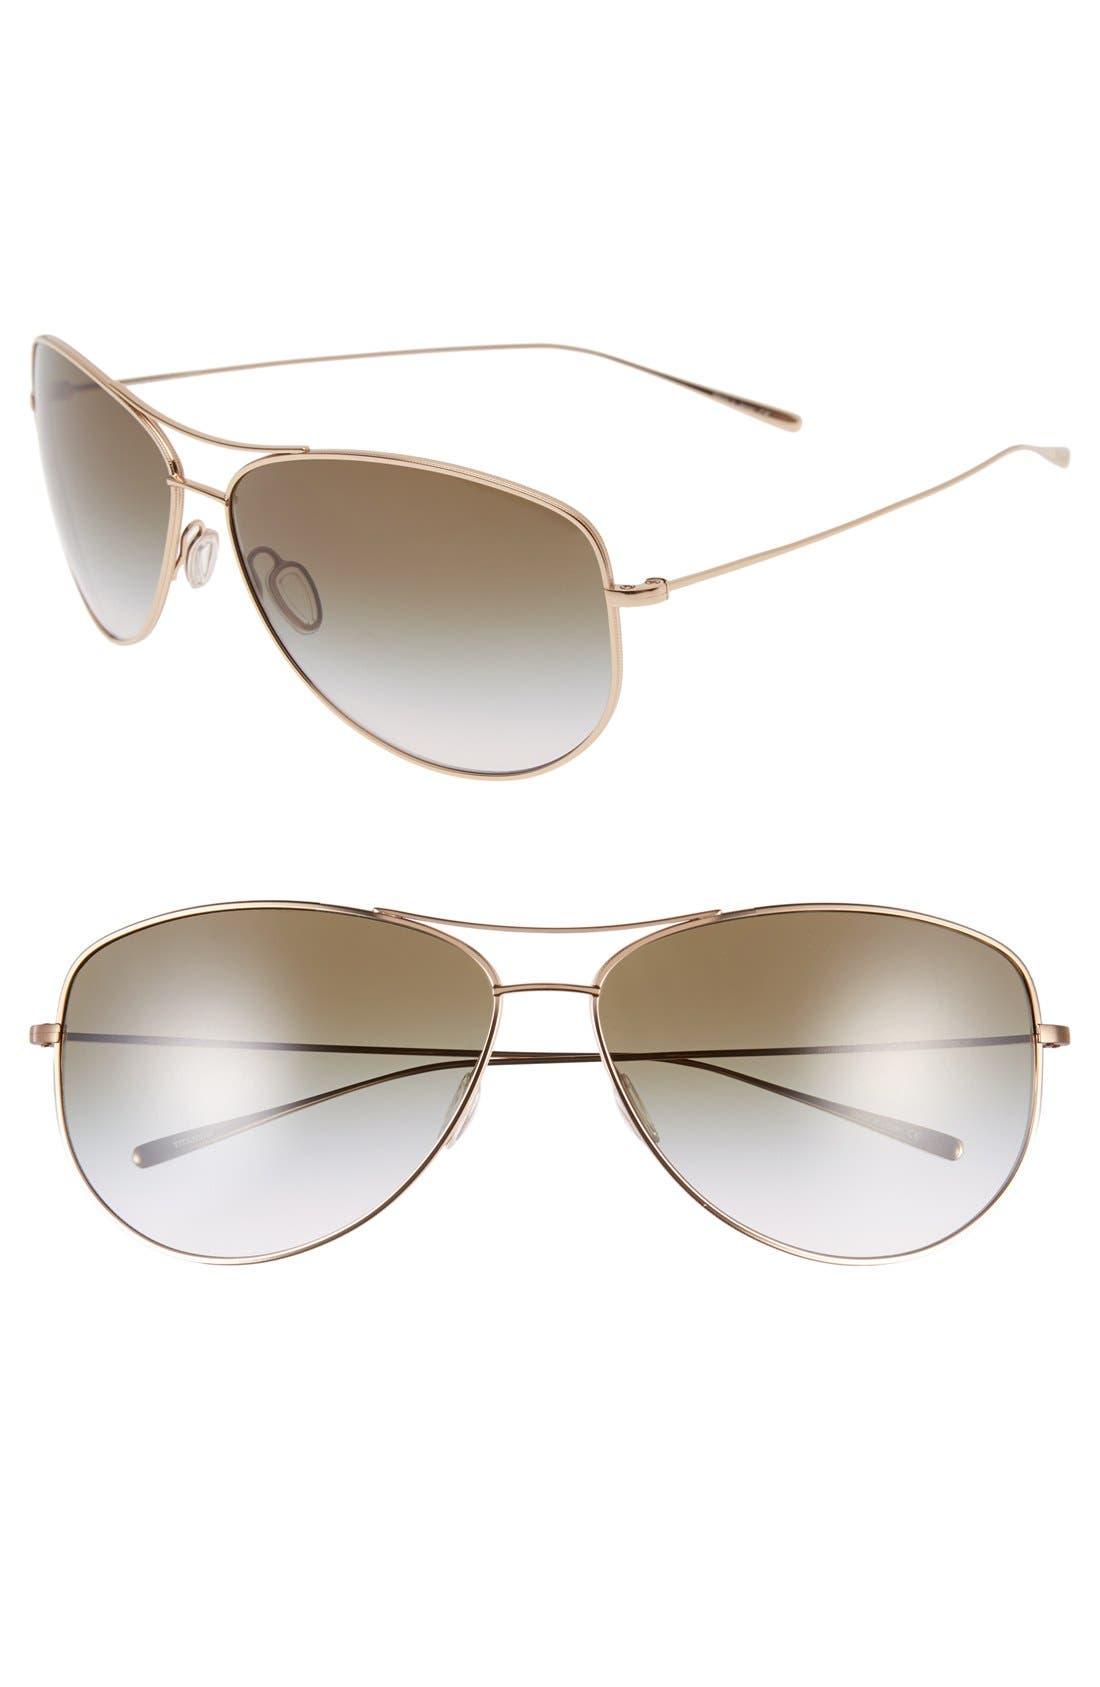 Alternate Image 1 Selected - Oliver Peoples 'Kempner' 65mm Aviator Sunglasses